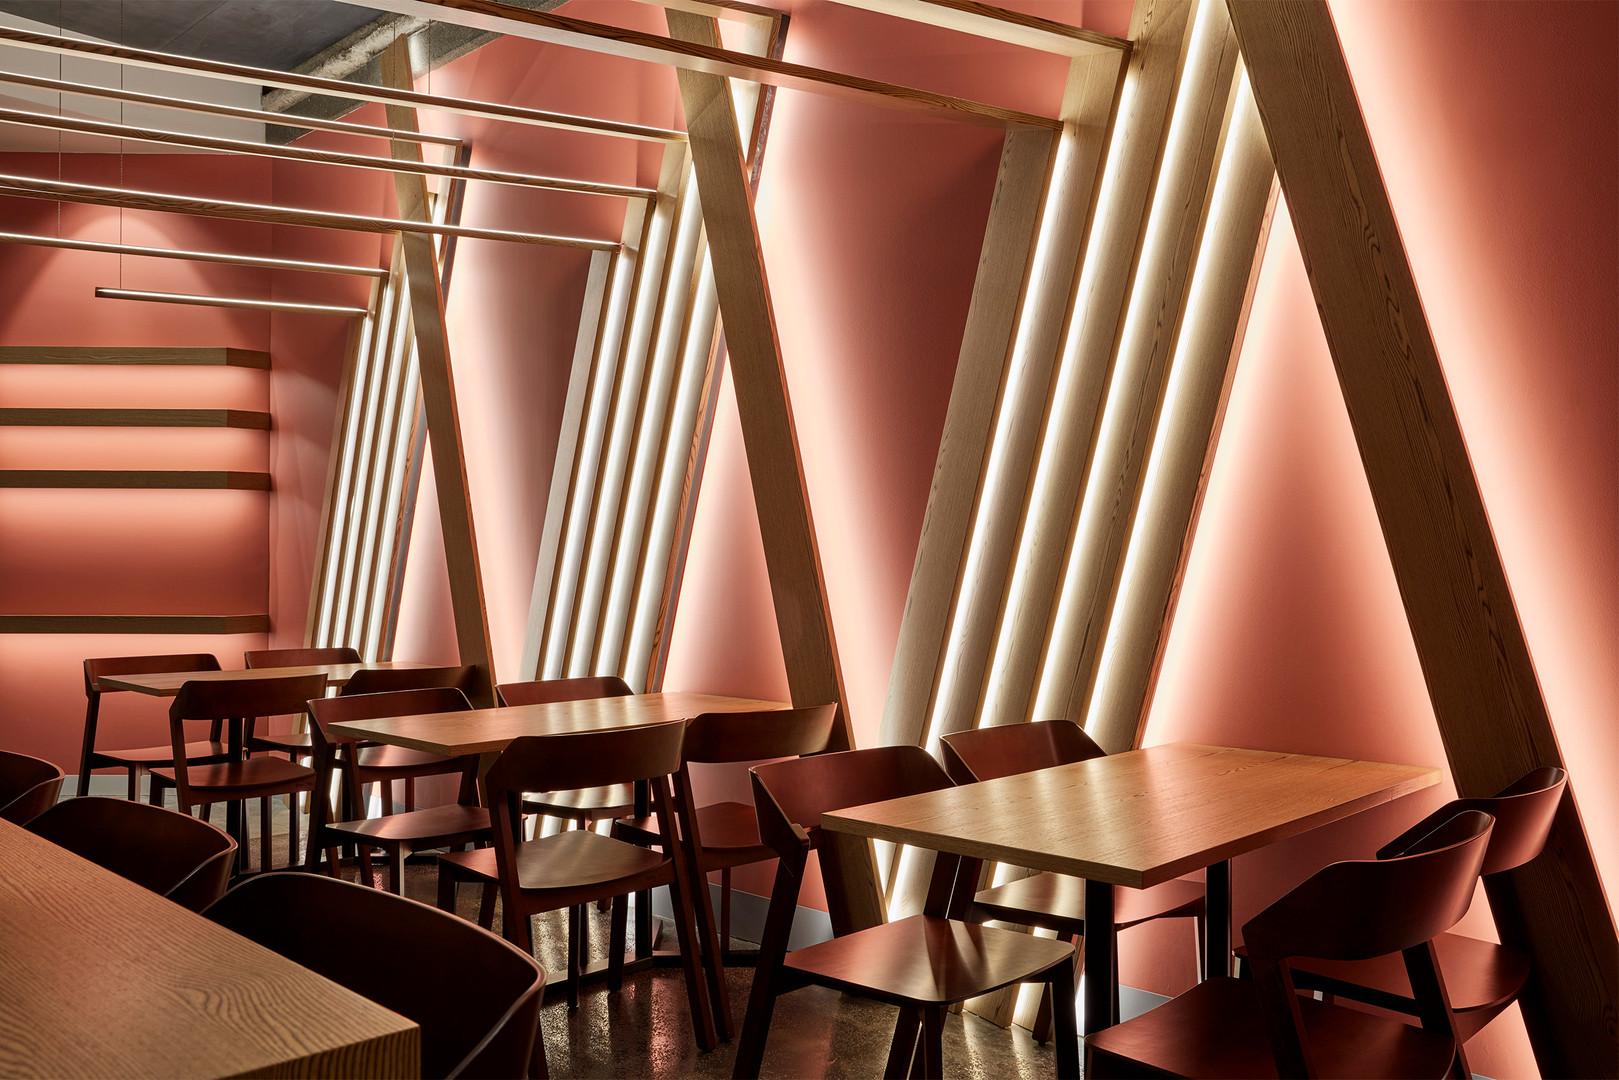 ZWEI-Atrium-Cafe-24212.jpg